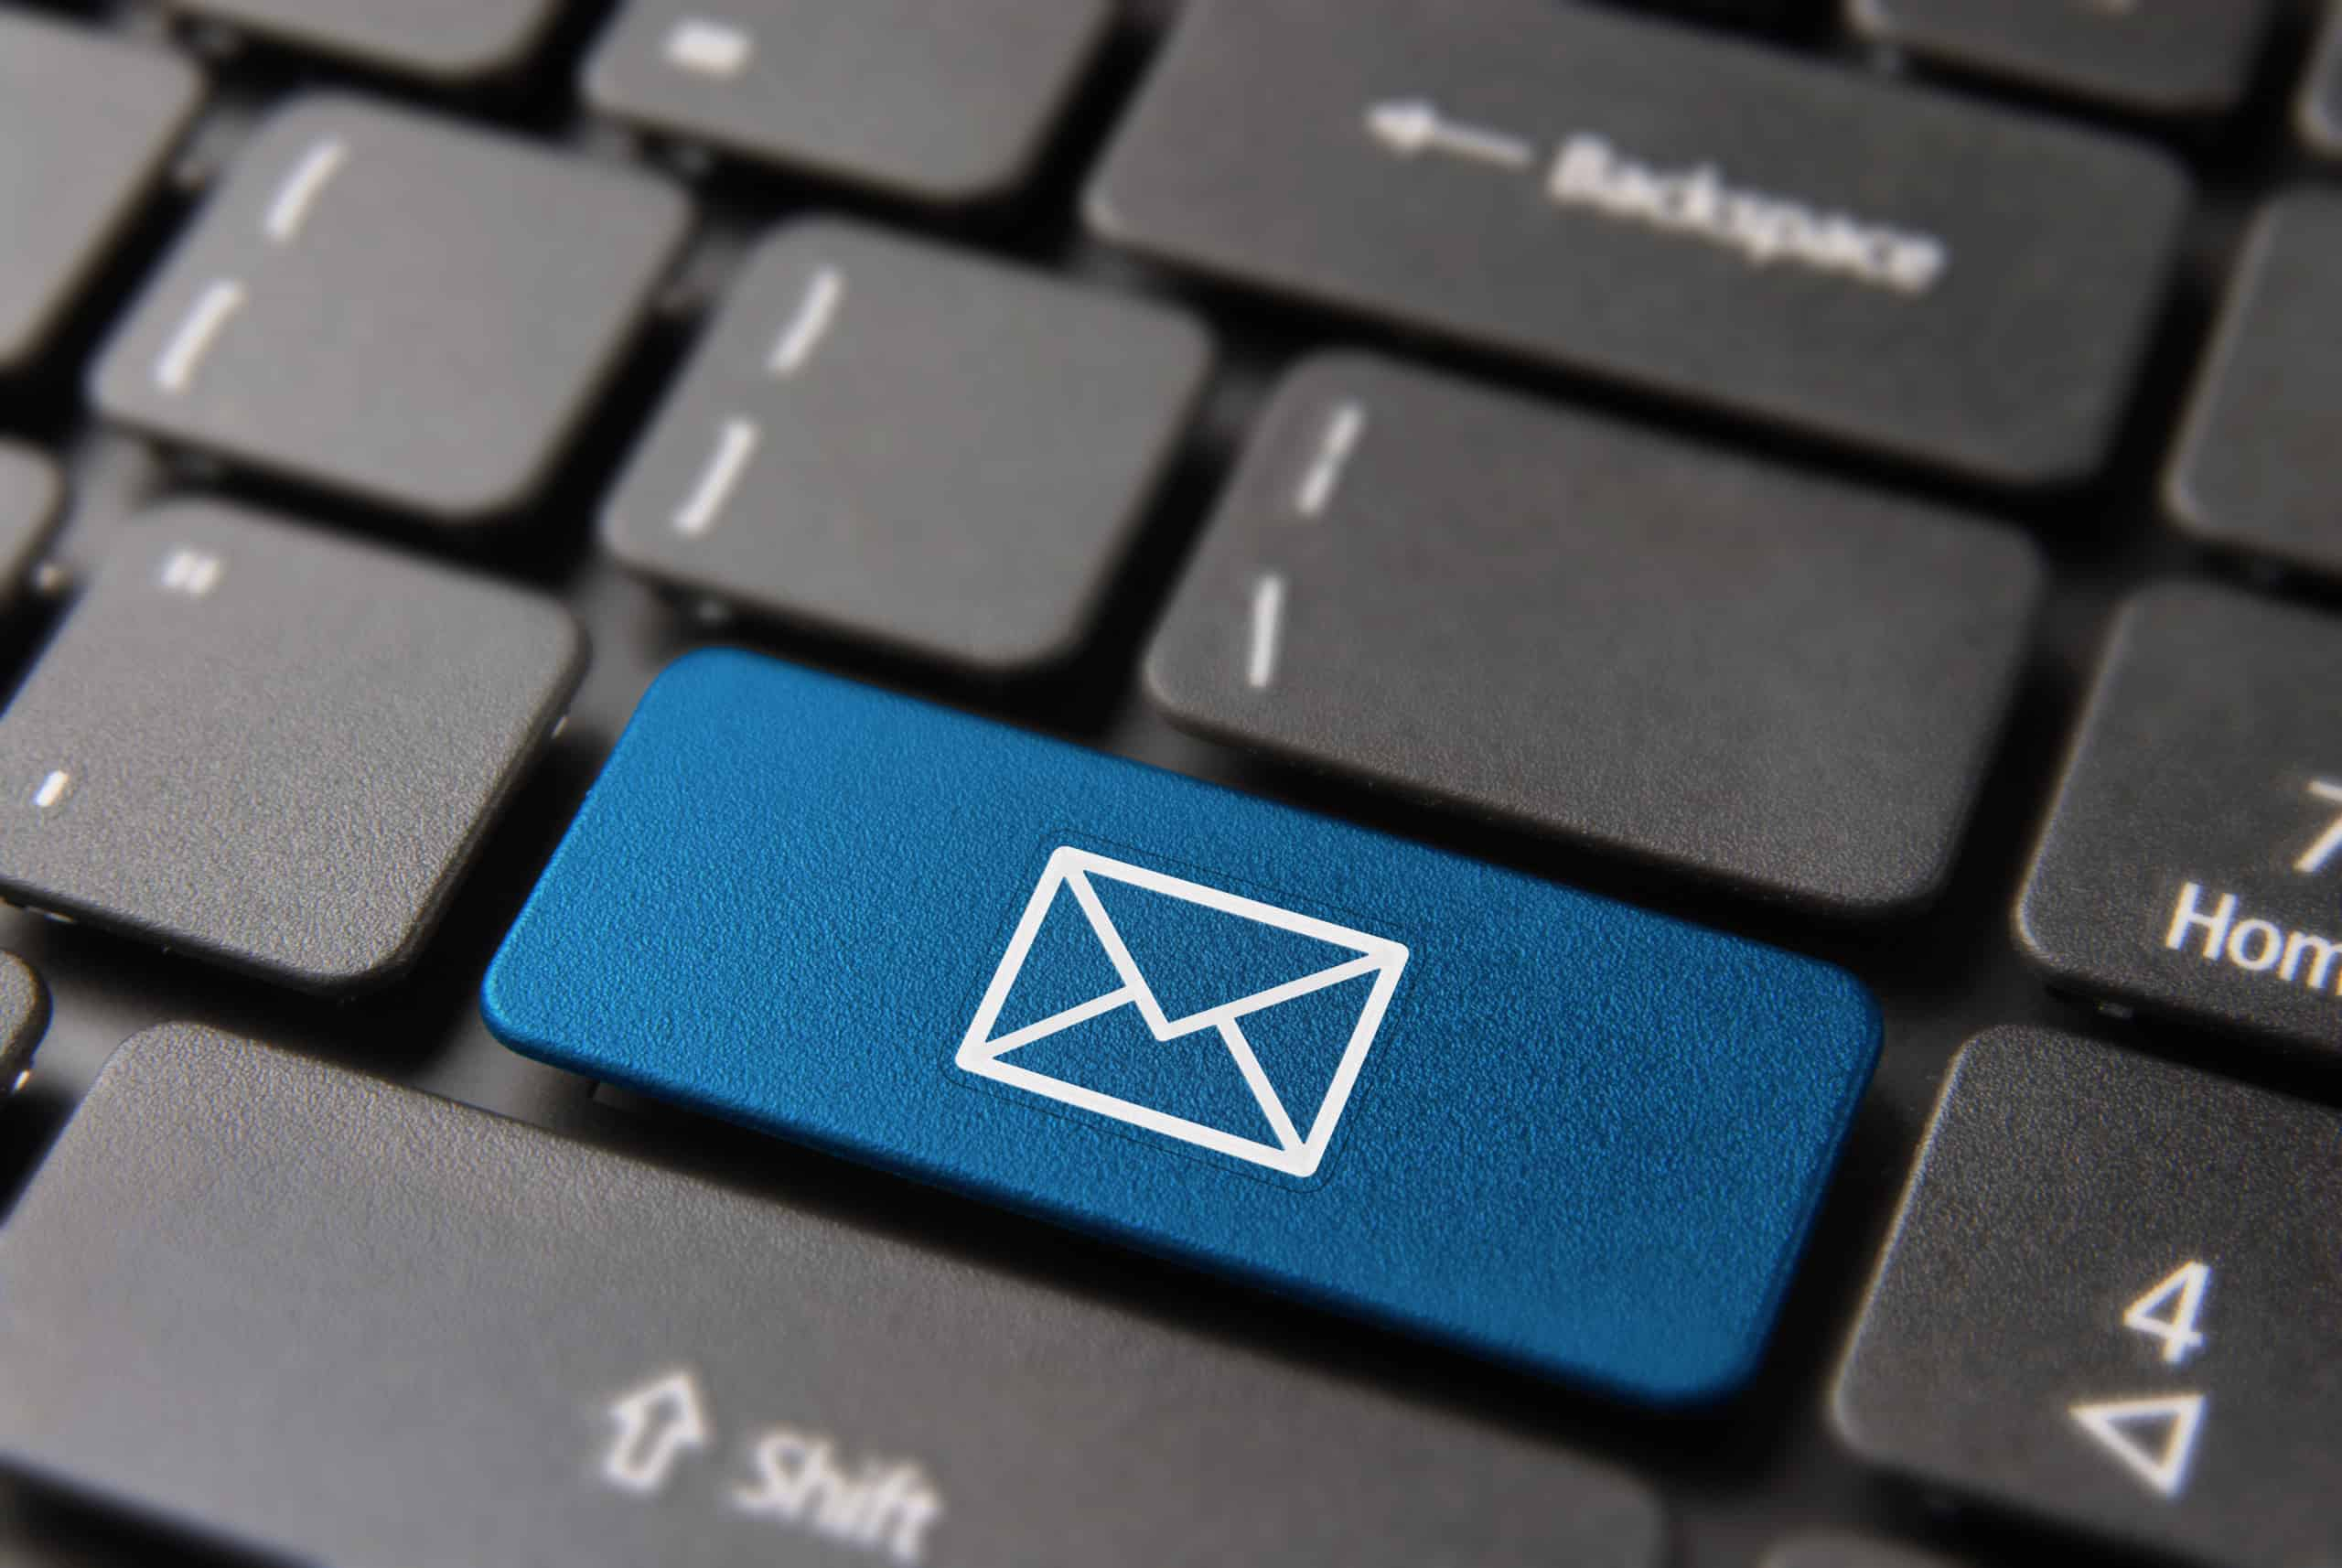 Email keyboard key